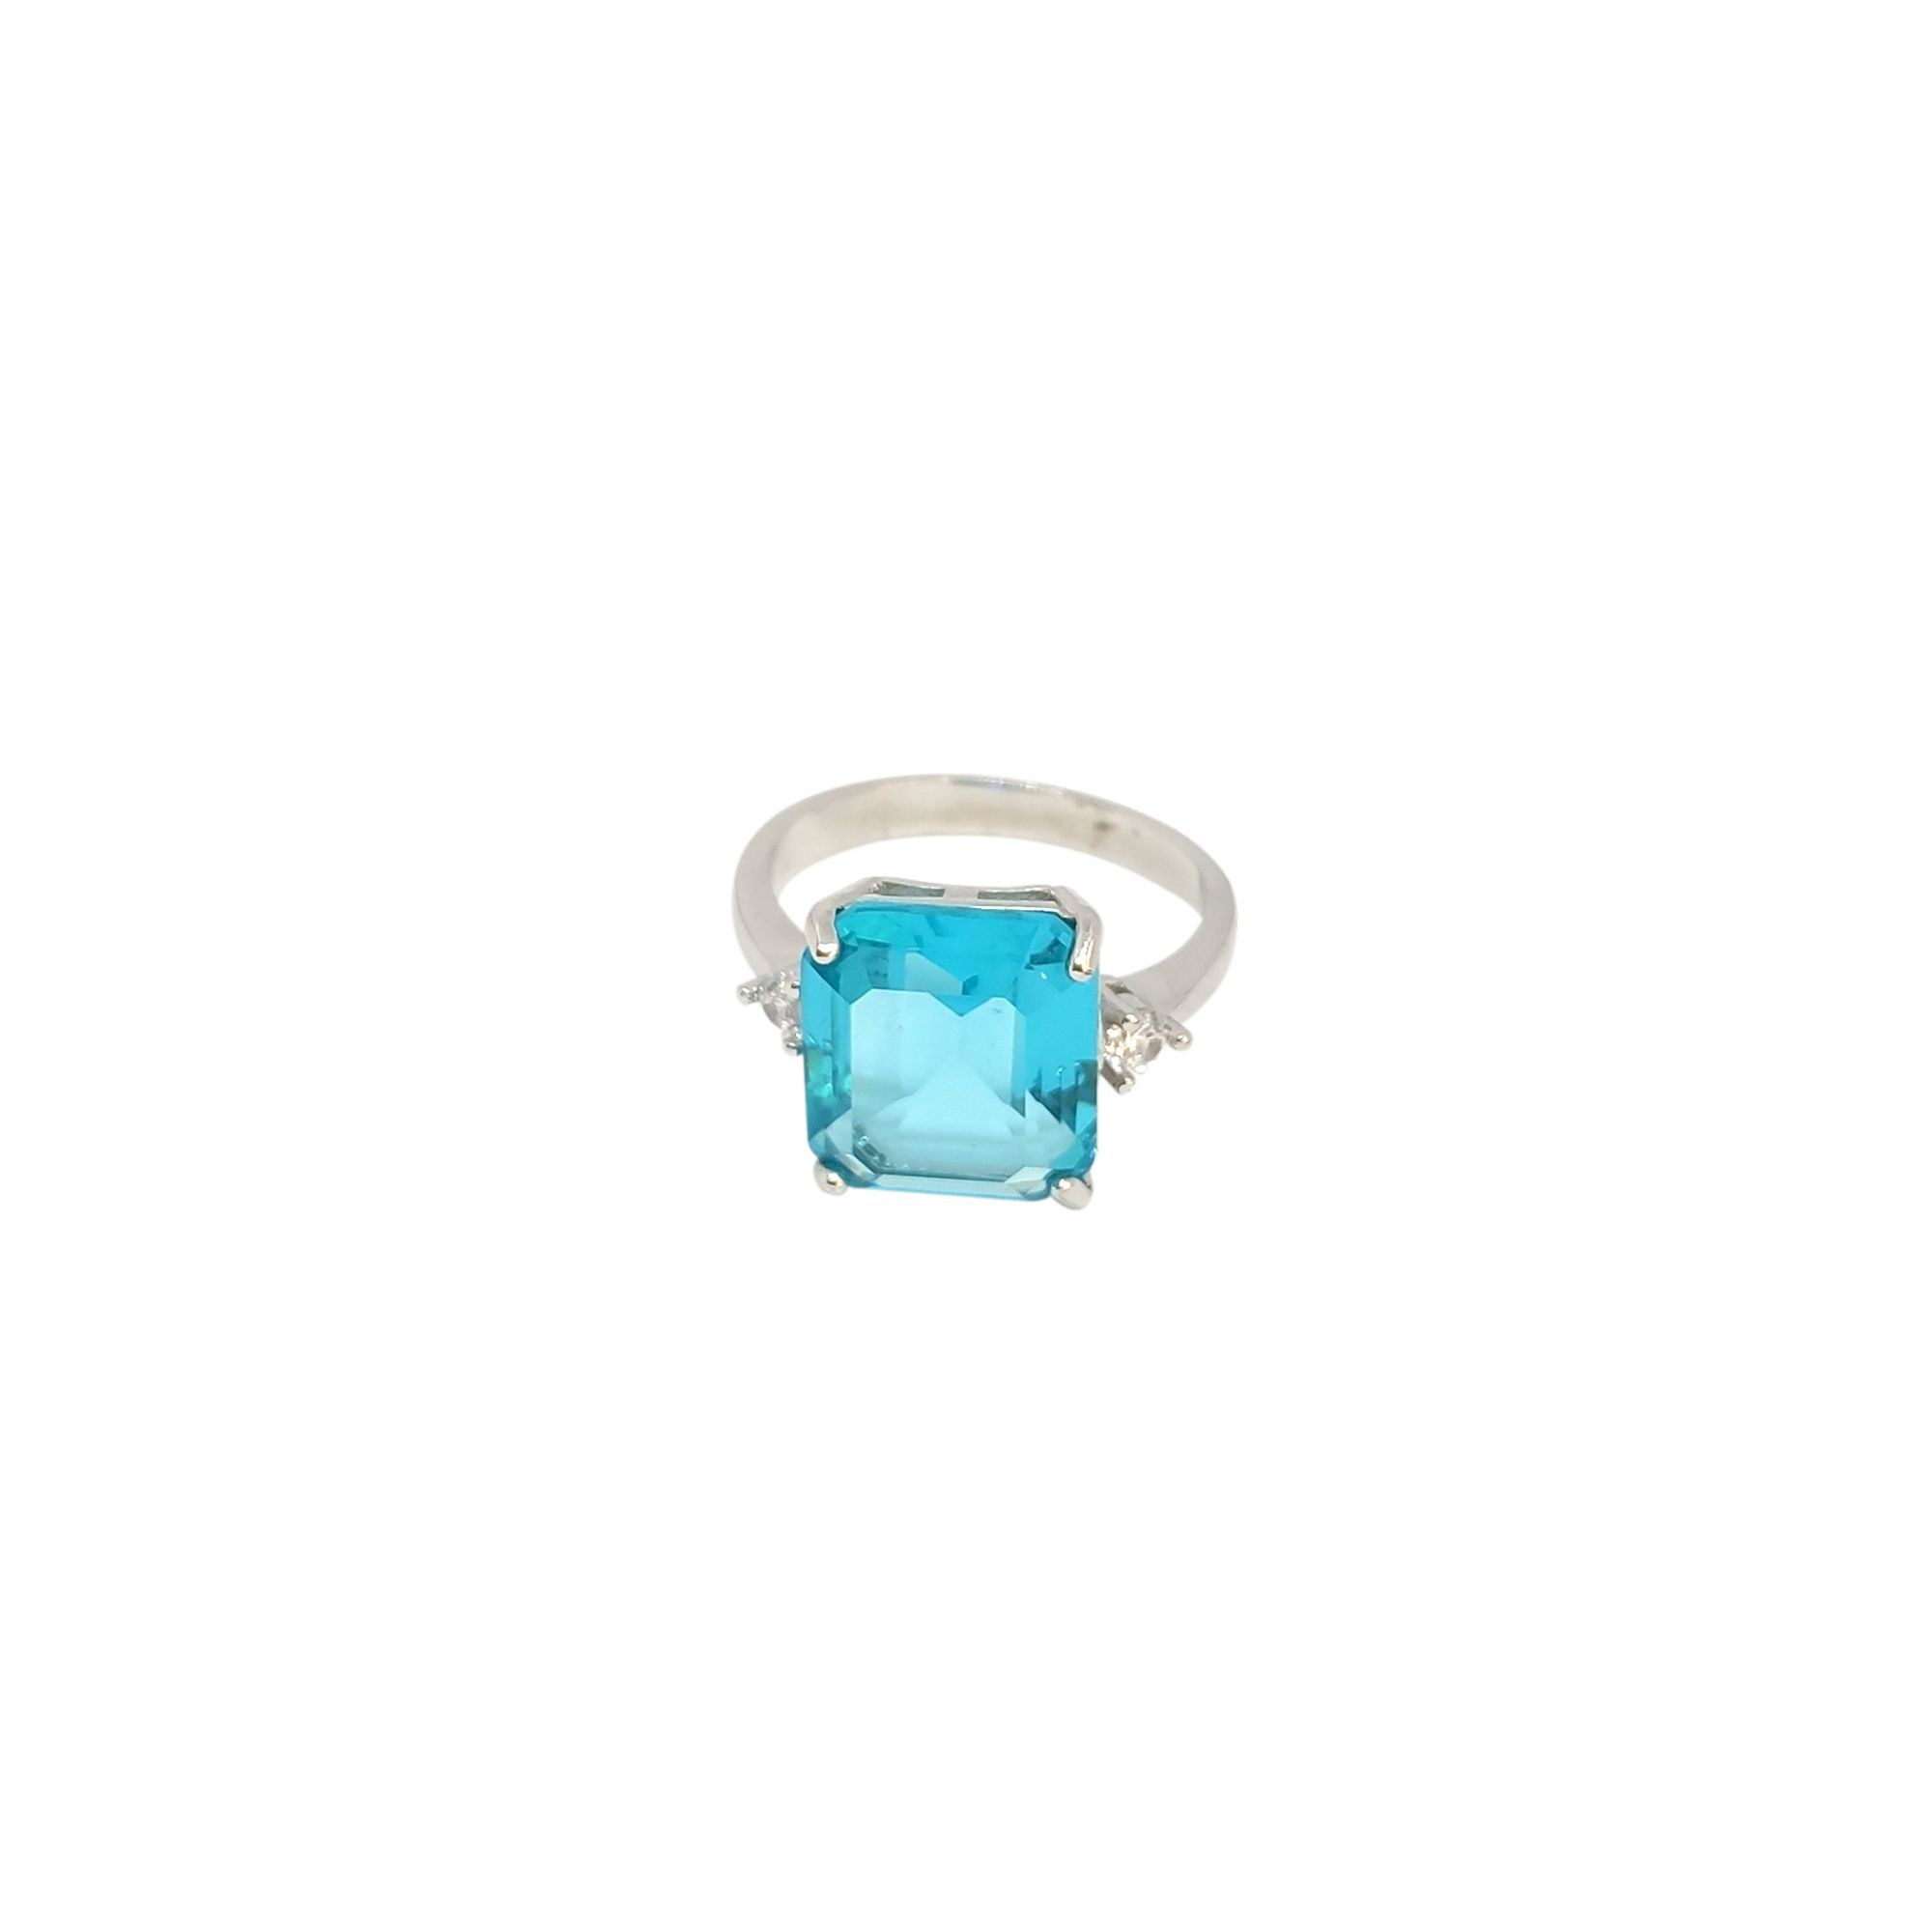 Anel retangular cristal azul ródio